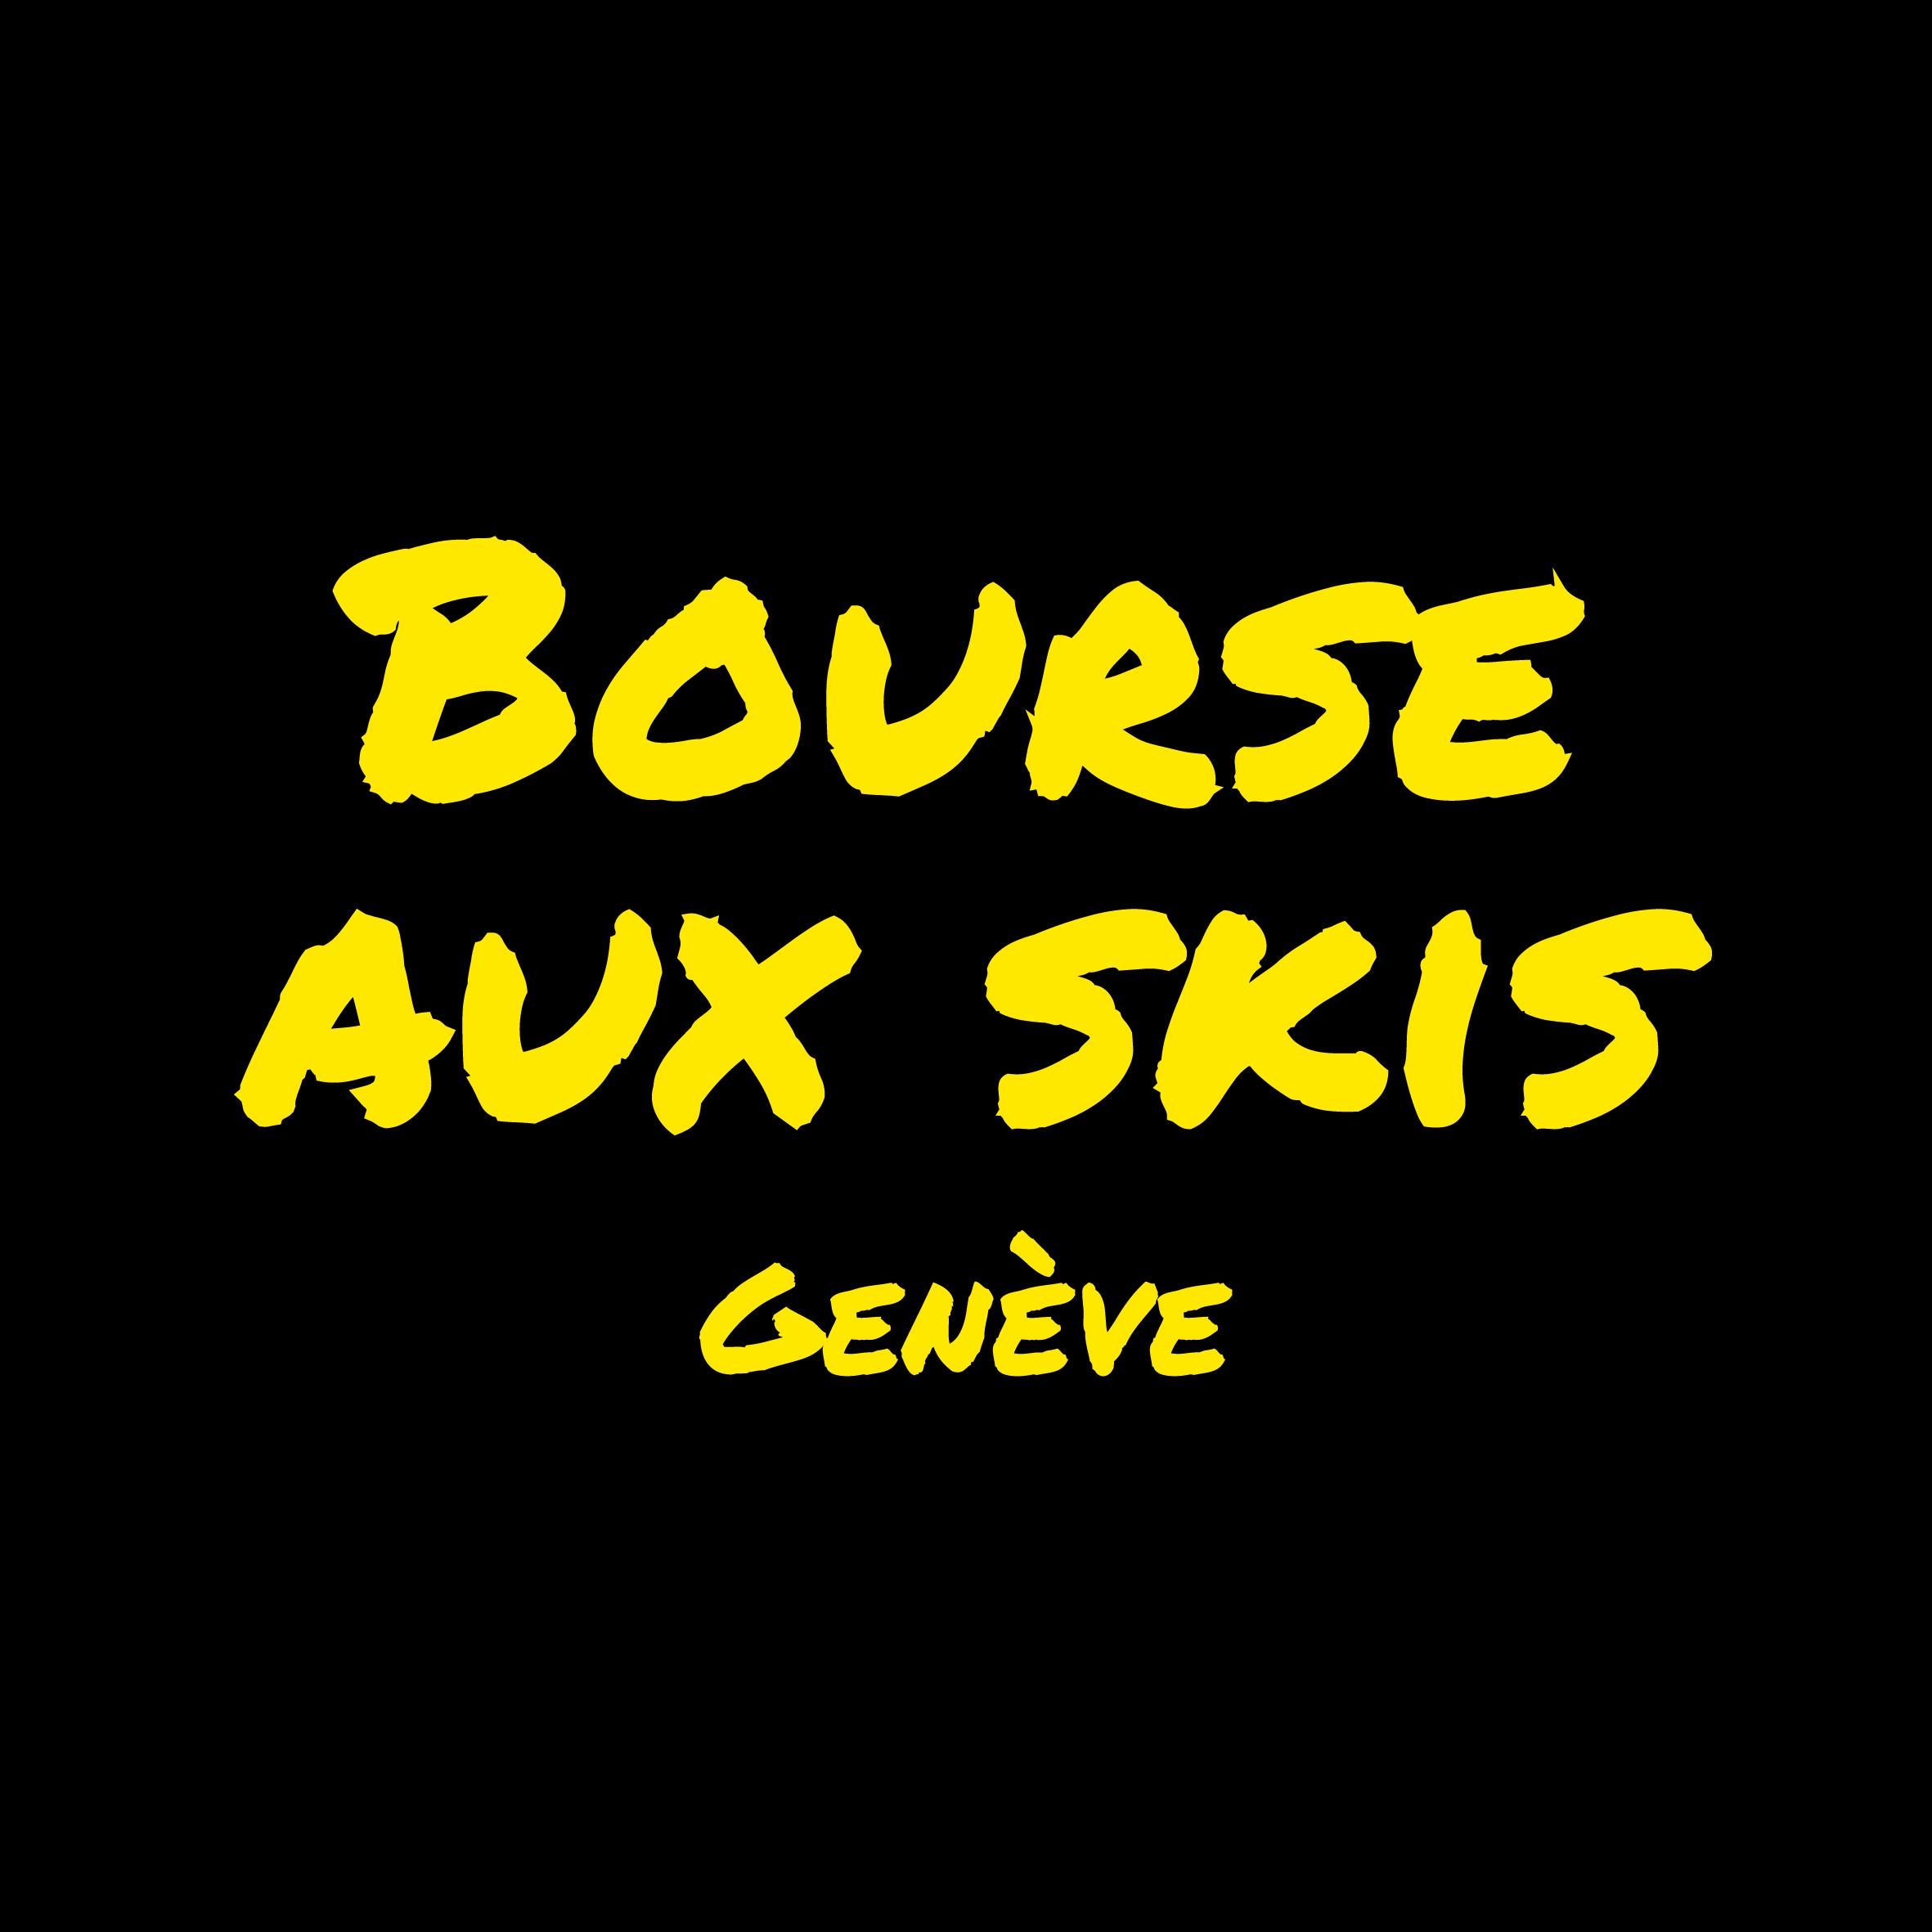 Bourse aux skis Genève Logo